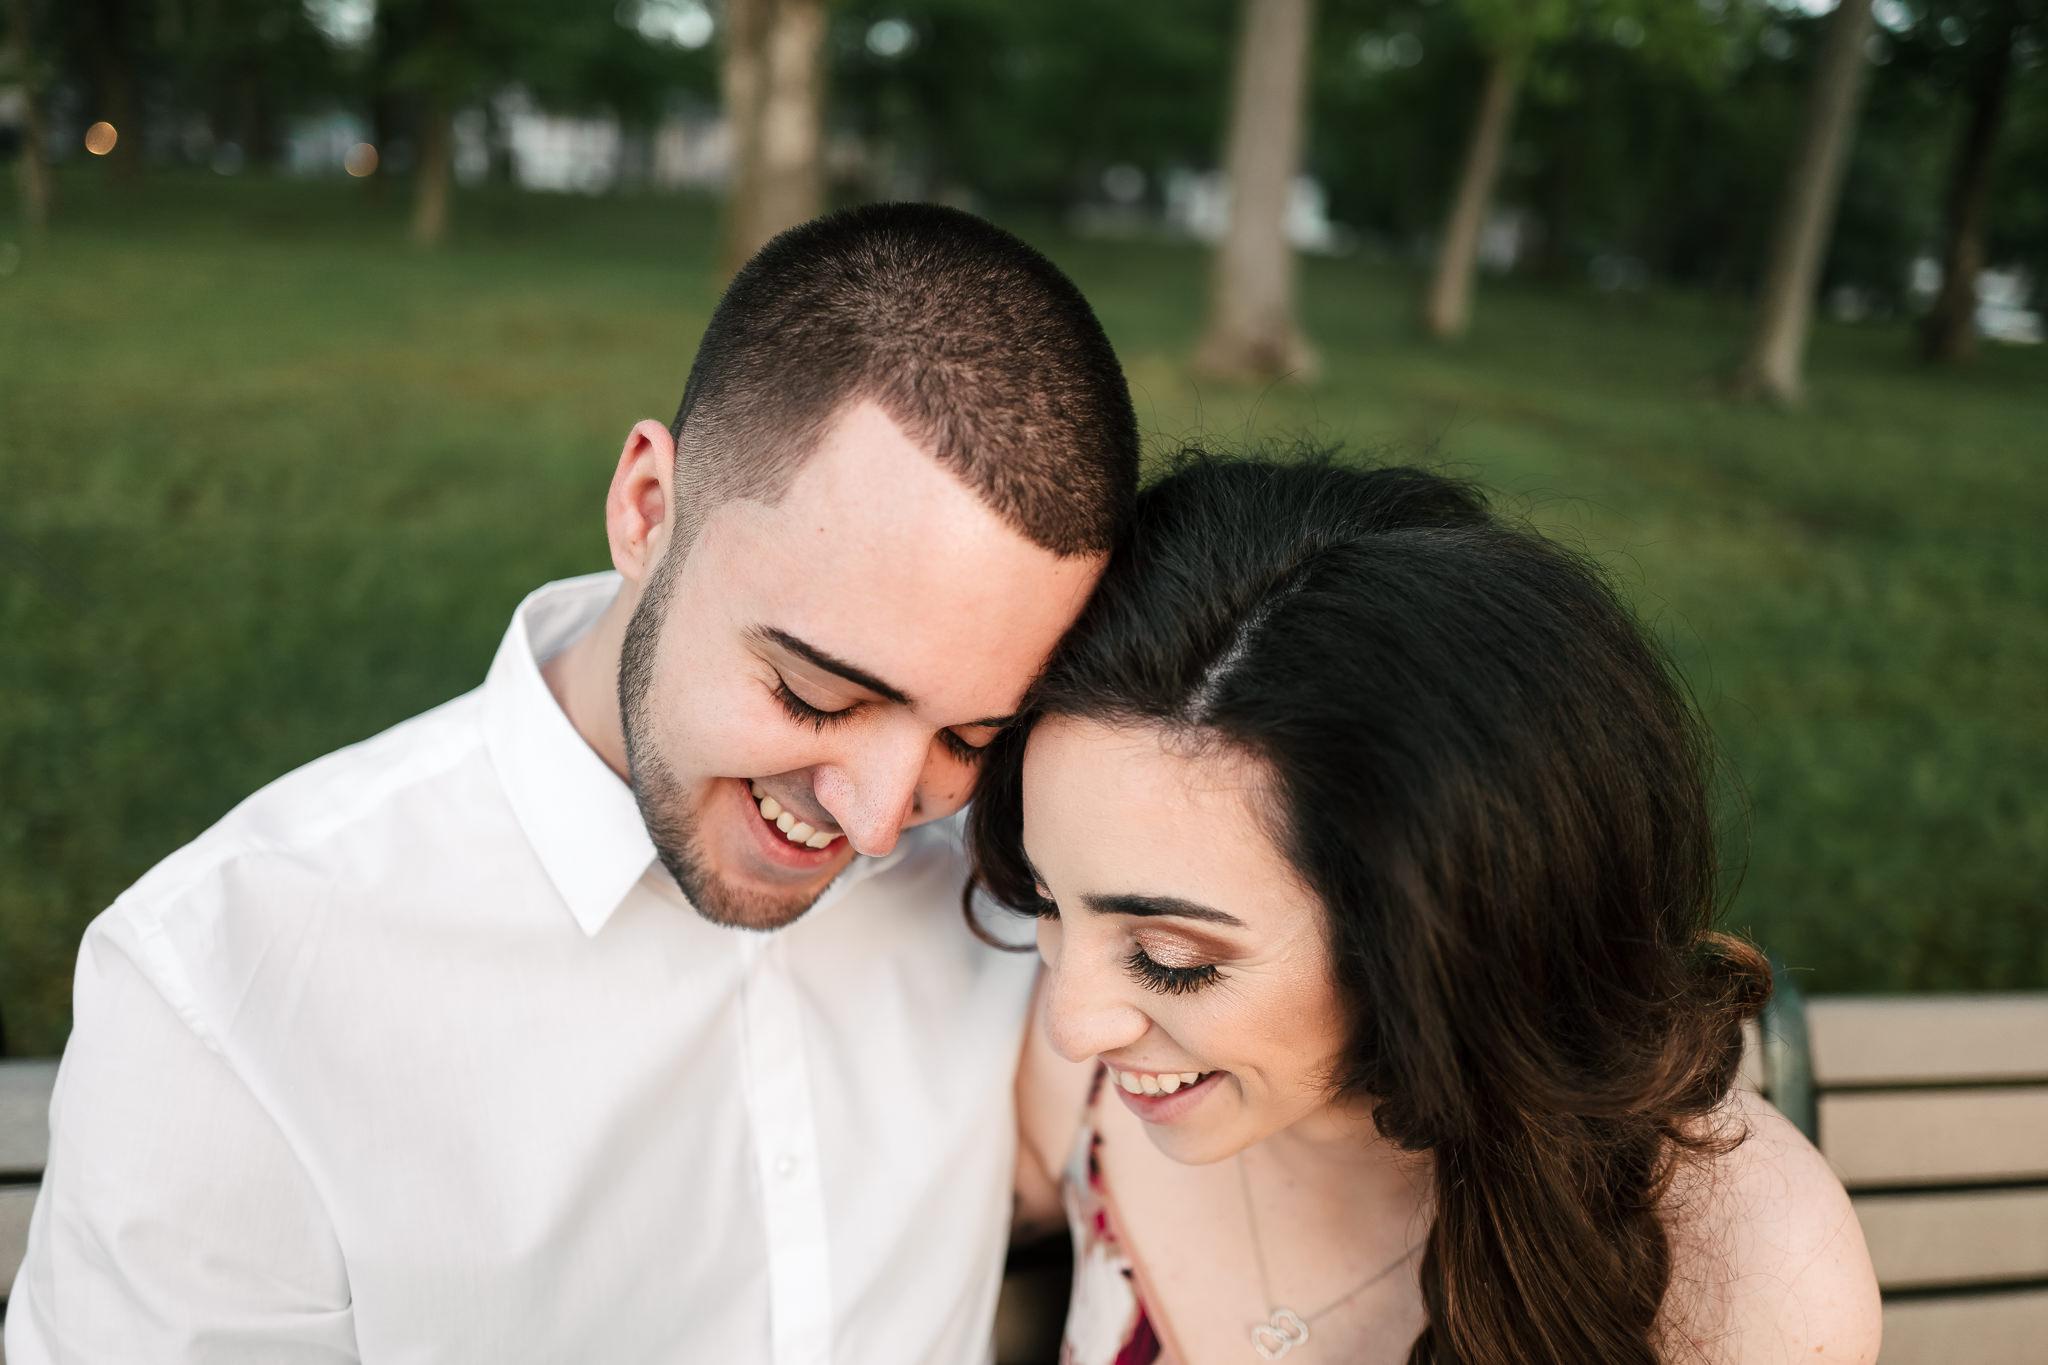 VERONA_PARK_ENGAGEMENT_TAMPA_WEDDING_PHOTOGRAPHER_1230203.jpg